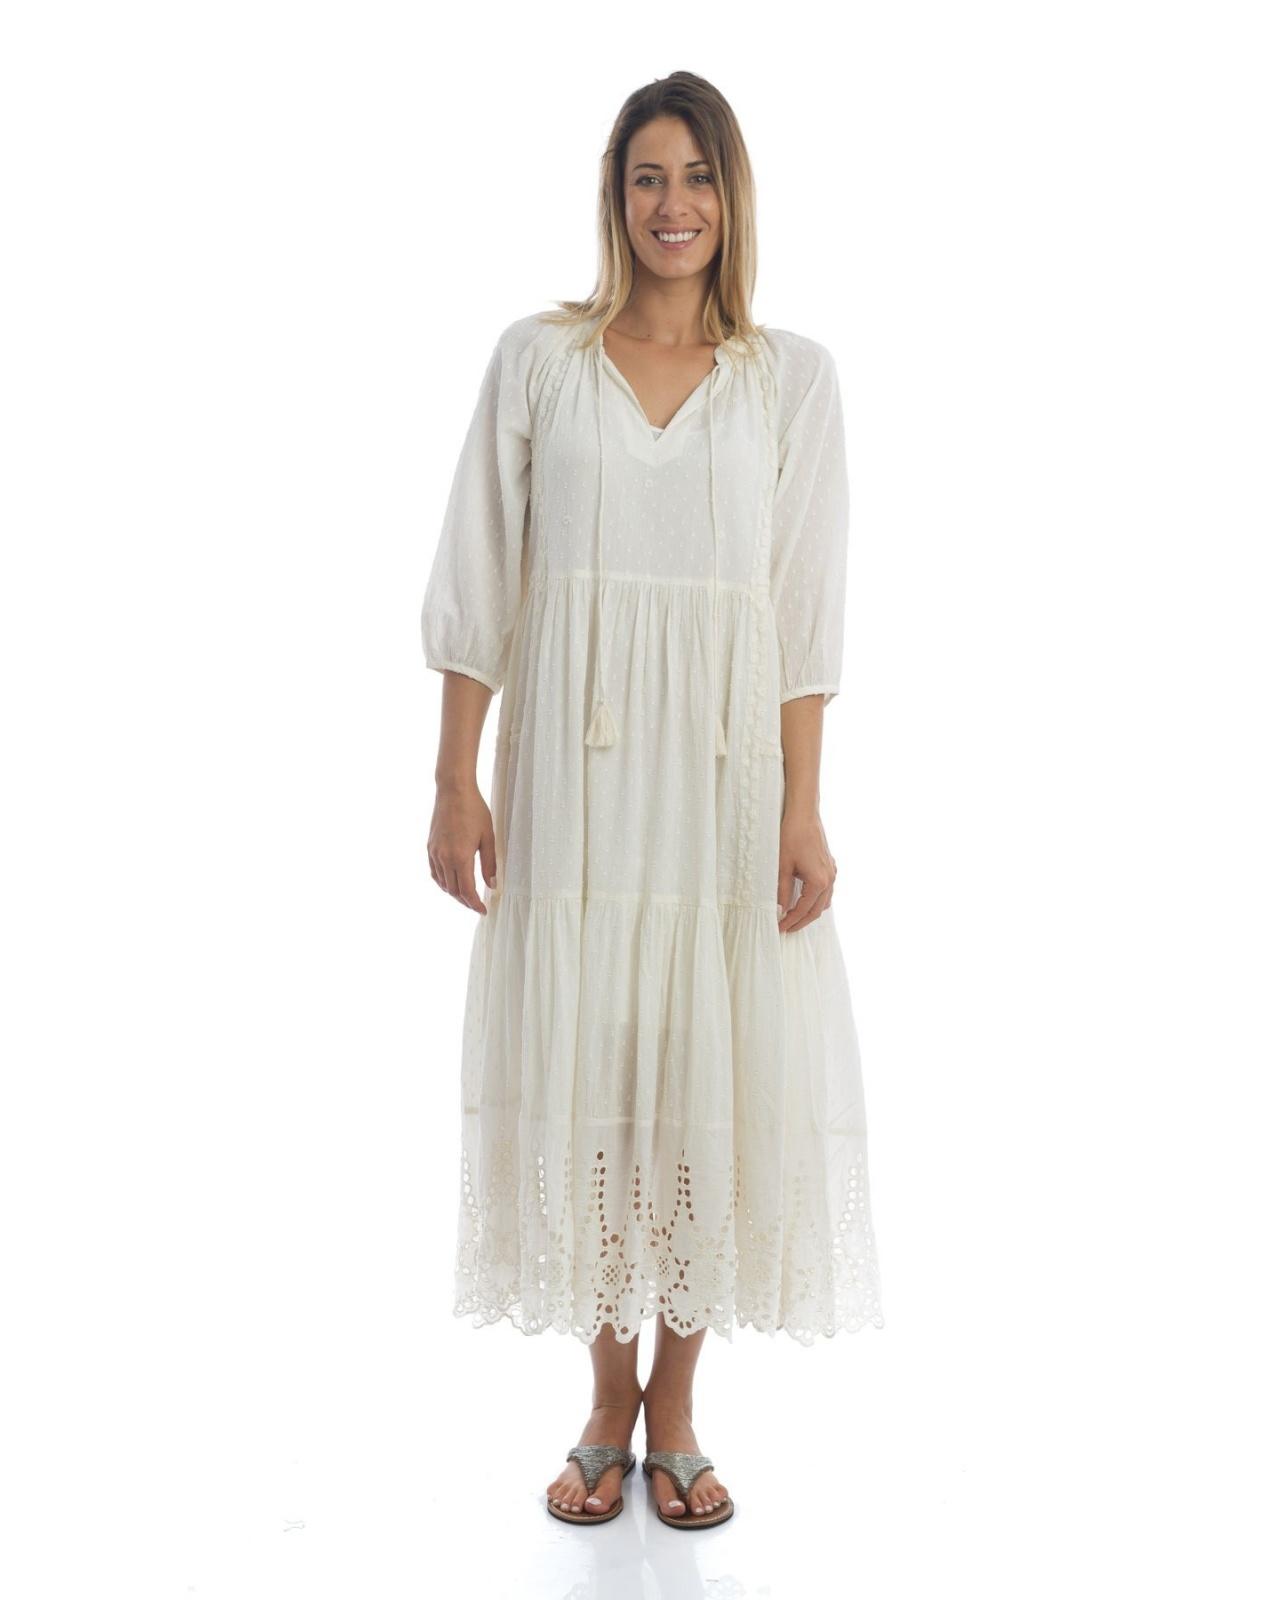 longue robe boh me blanche manches longues et col en v. Black Bedroom Furniture Sets. Home Design Ideas